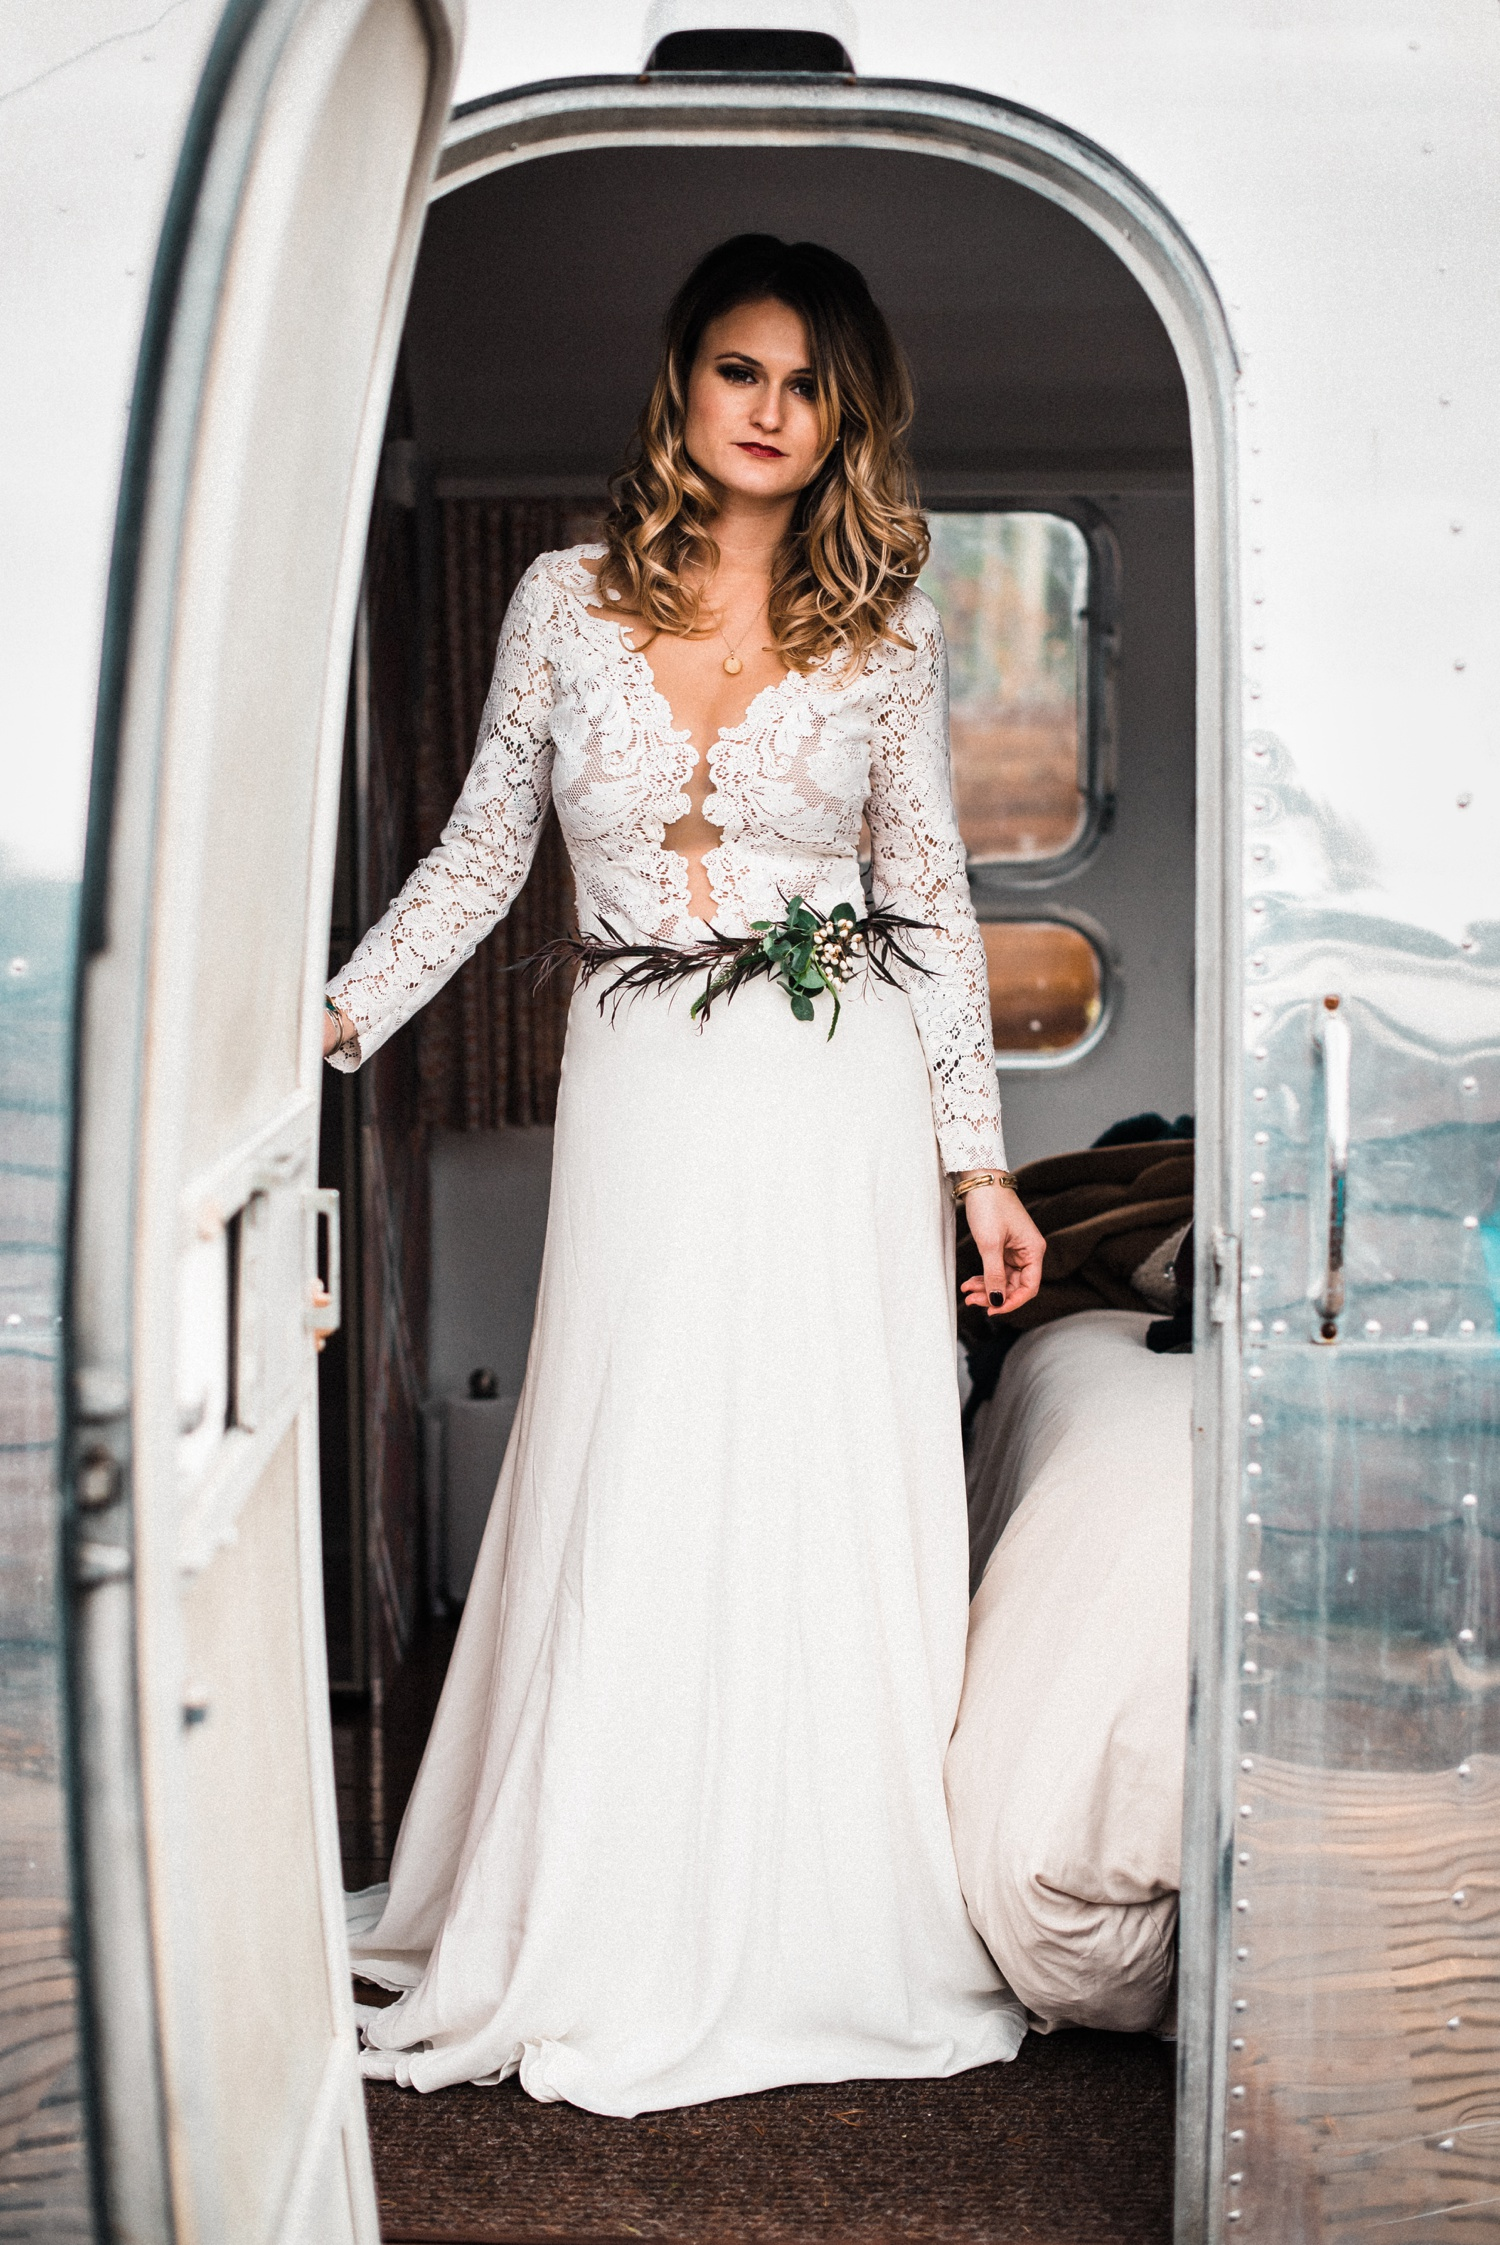 Oregon_Coast_Elopement_Wedding_The_Foxes_Photography_069-2.jpg